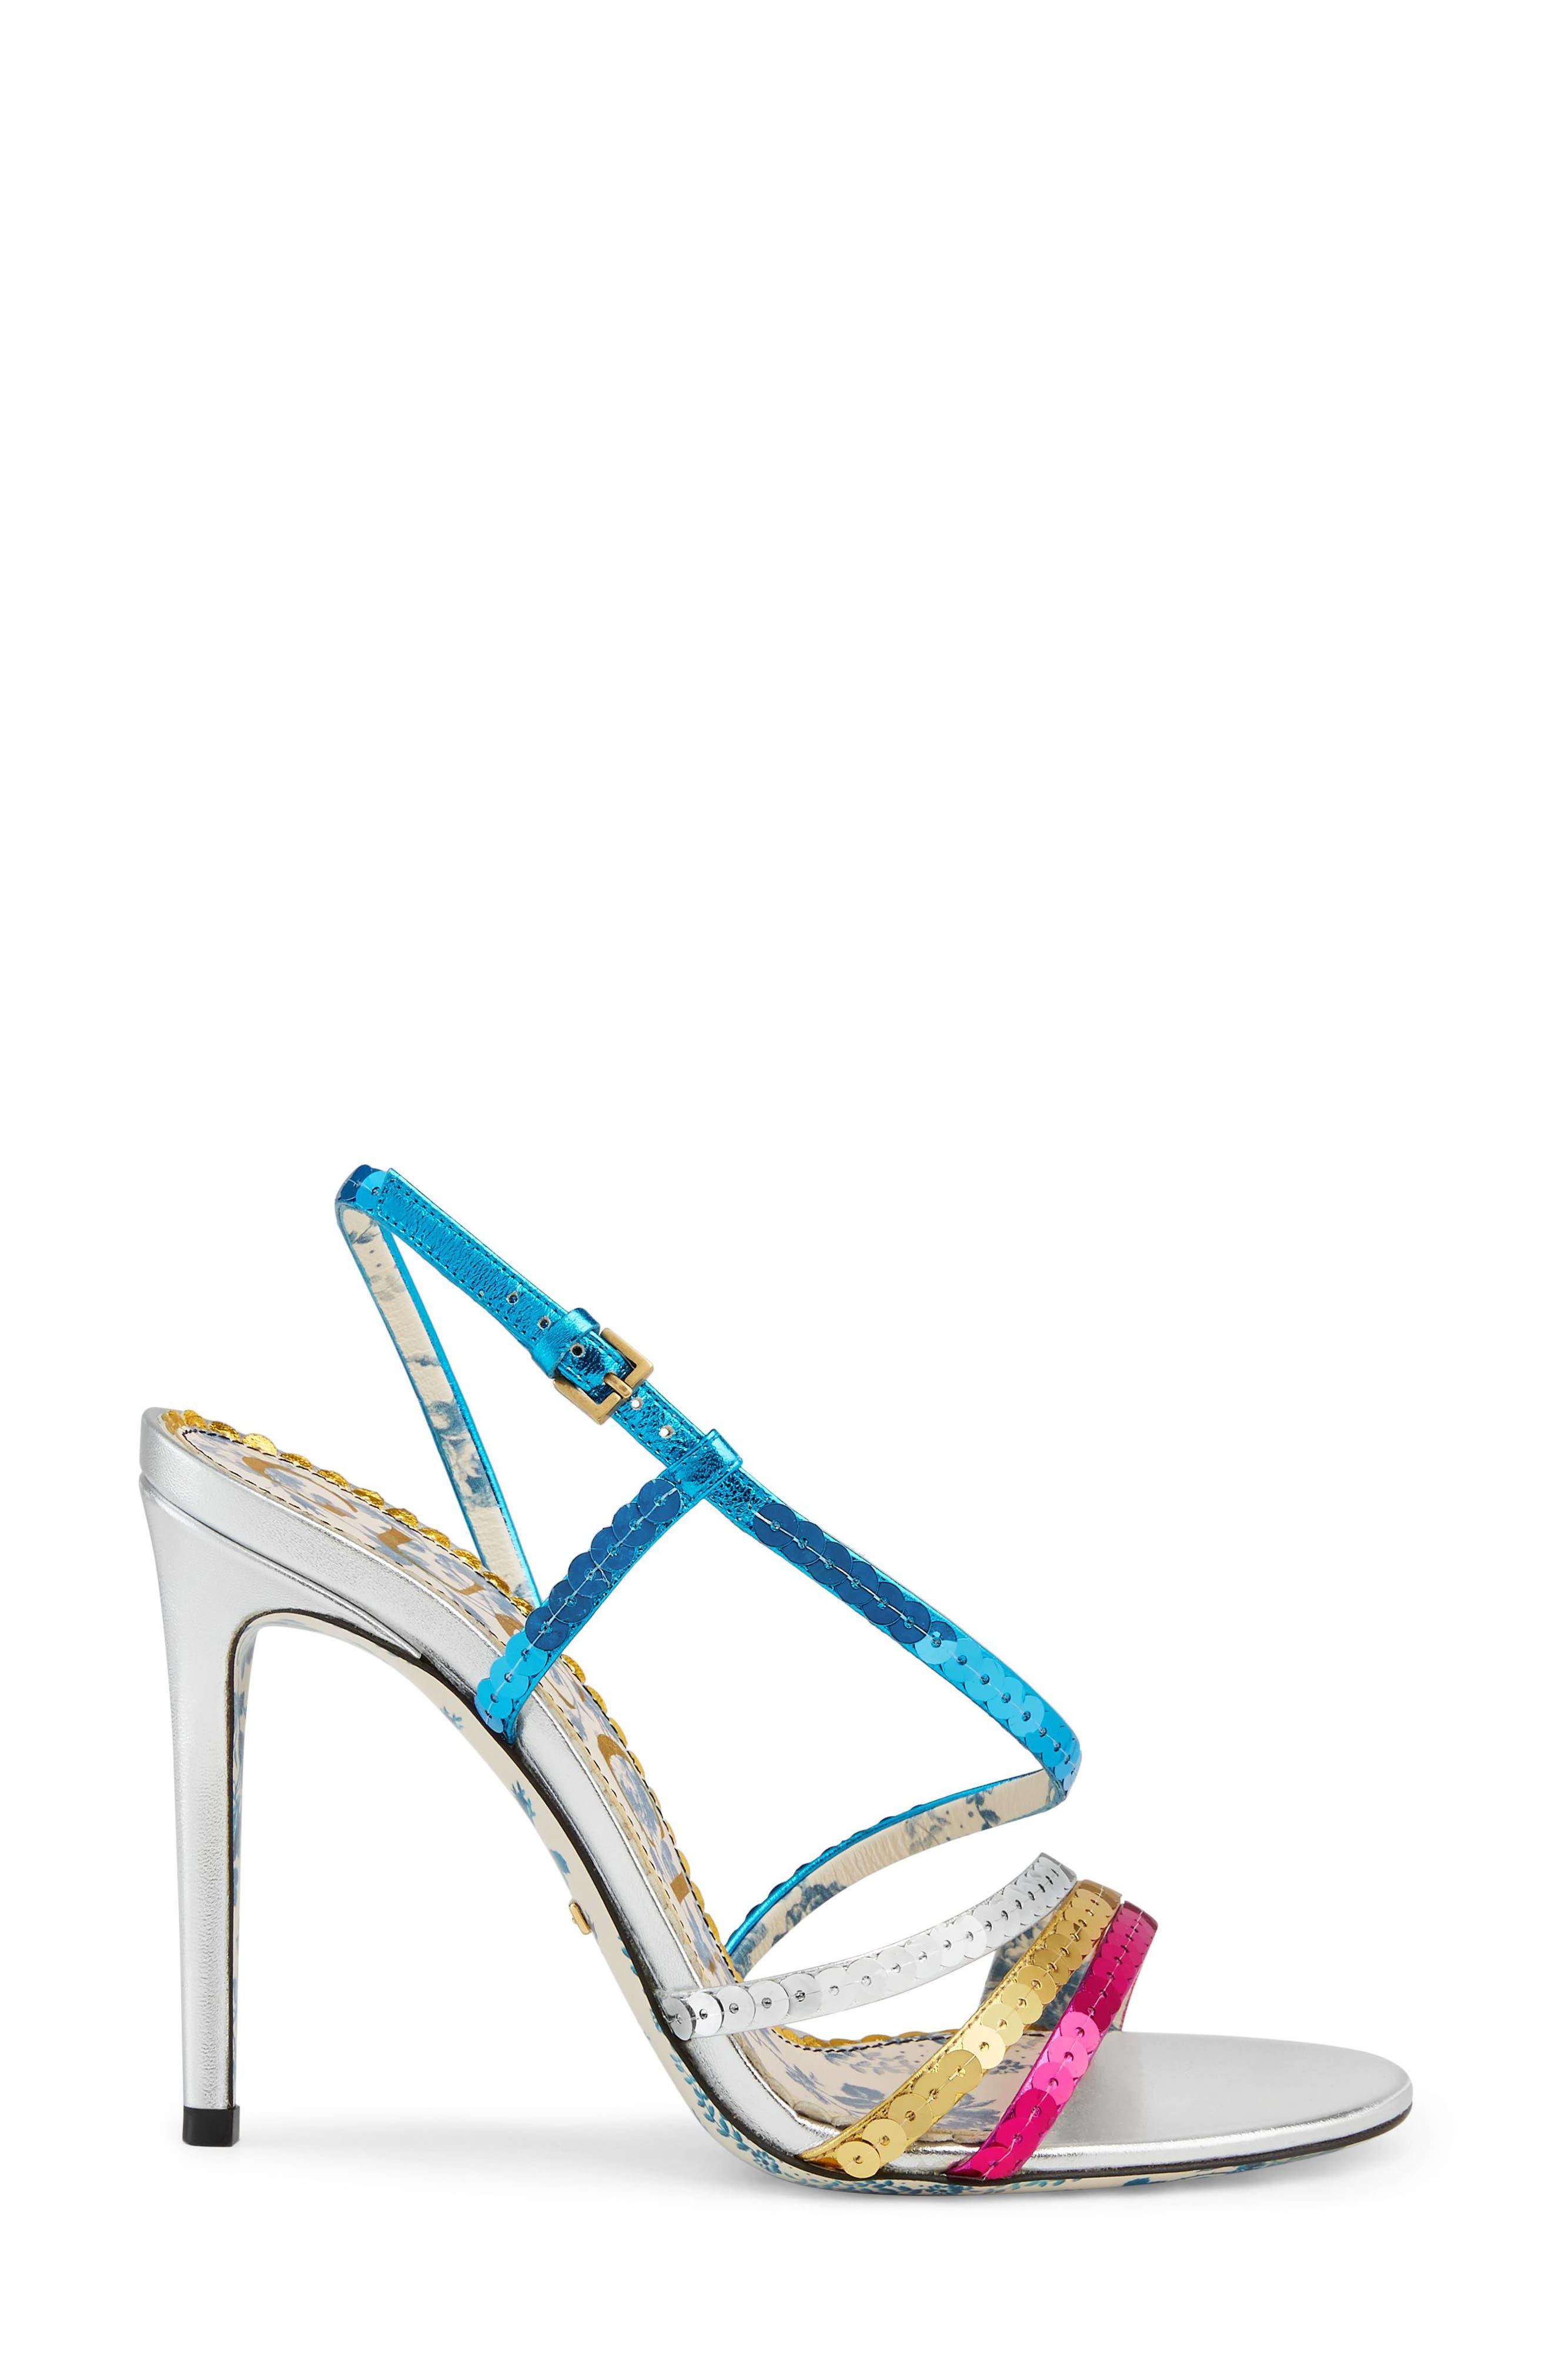 Sequin Sandal,                             Alternate thumbnail 2, color,                             Silver/ Blue/ Pink